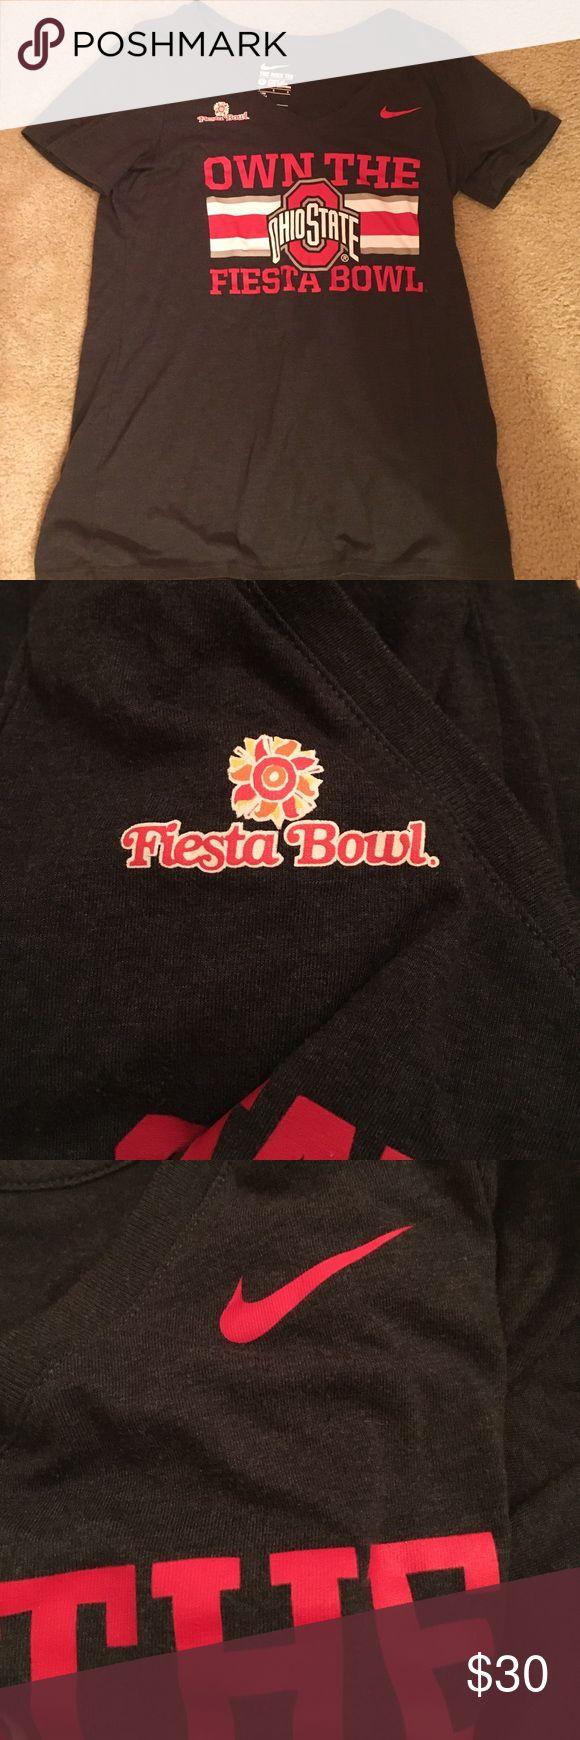 Ohio State Fiesta Bowl Game Shirt Fiesta Bowl and Nike Ohio State Game Shirt Nike Tops Tees - Short Sleeve